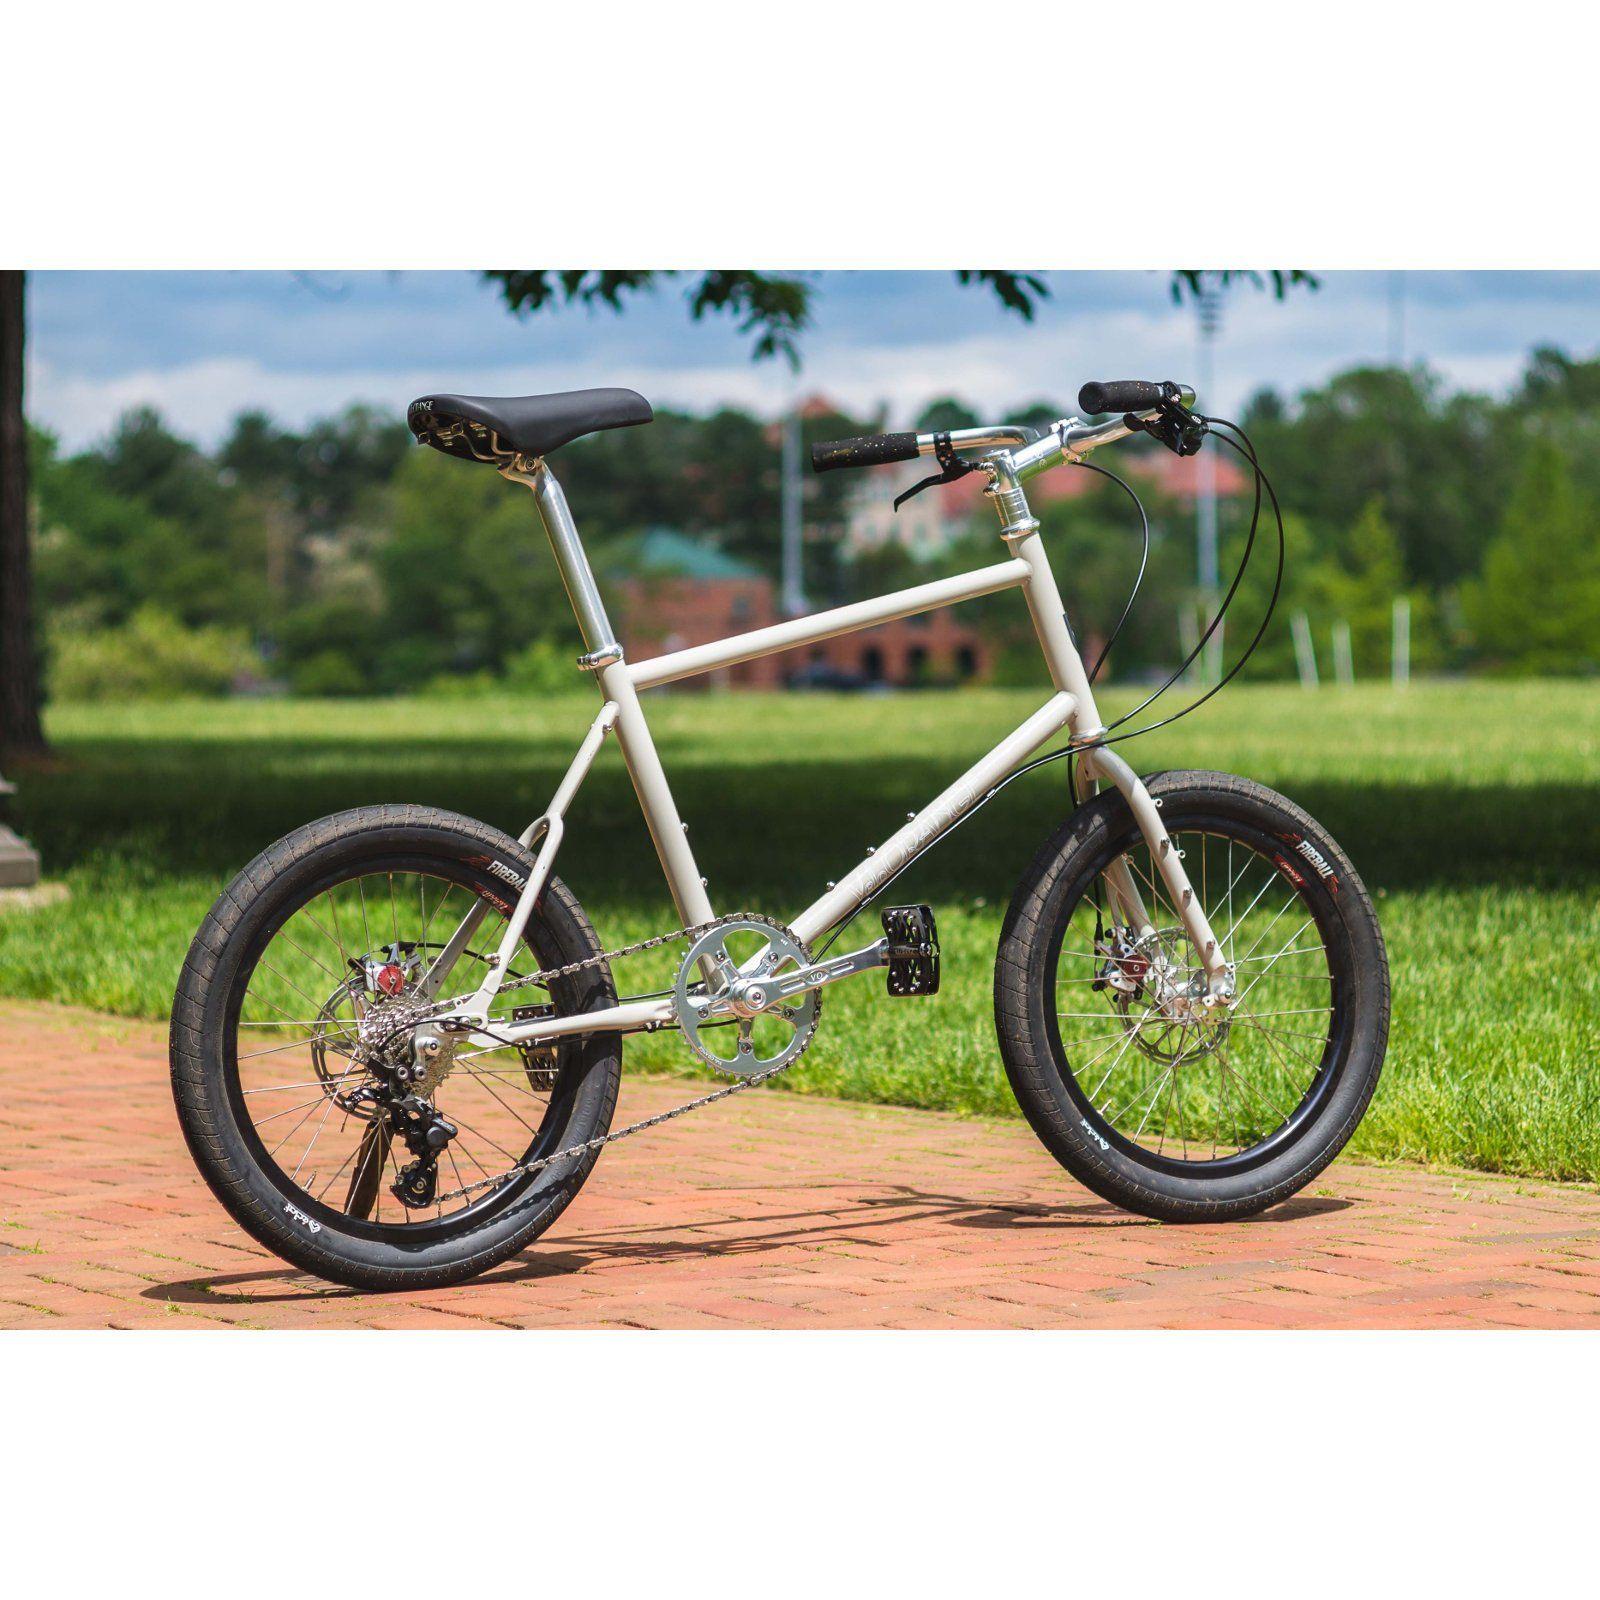 Neutrino Complete Bike Sepeda